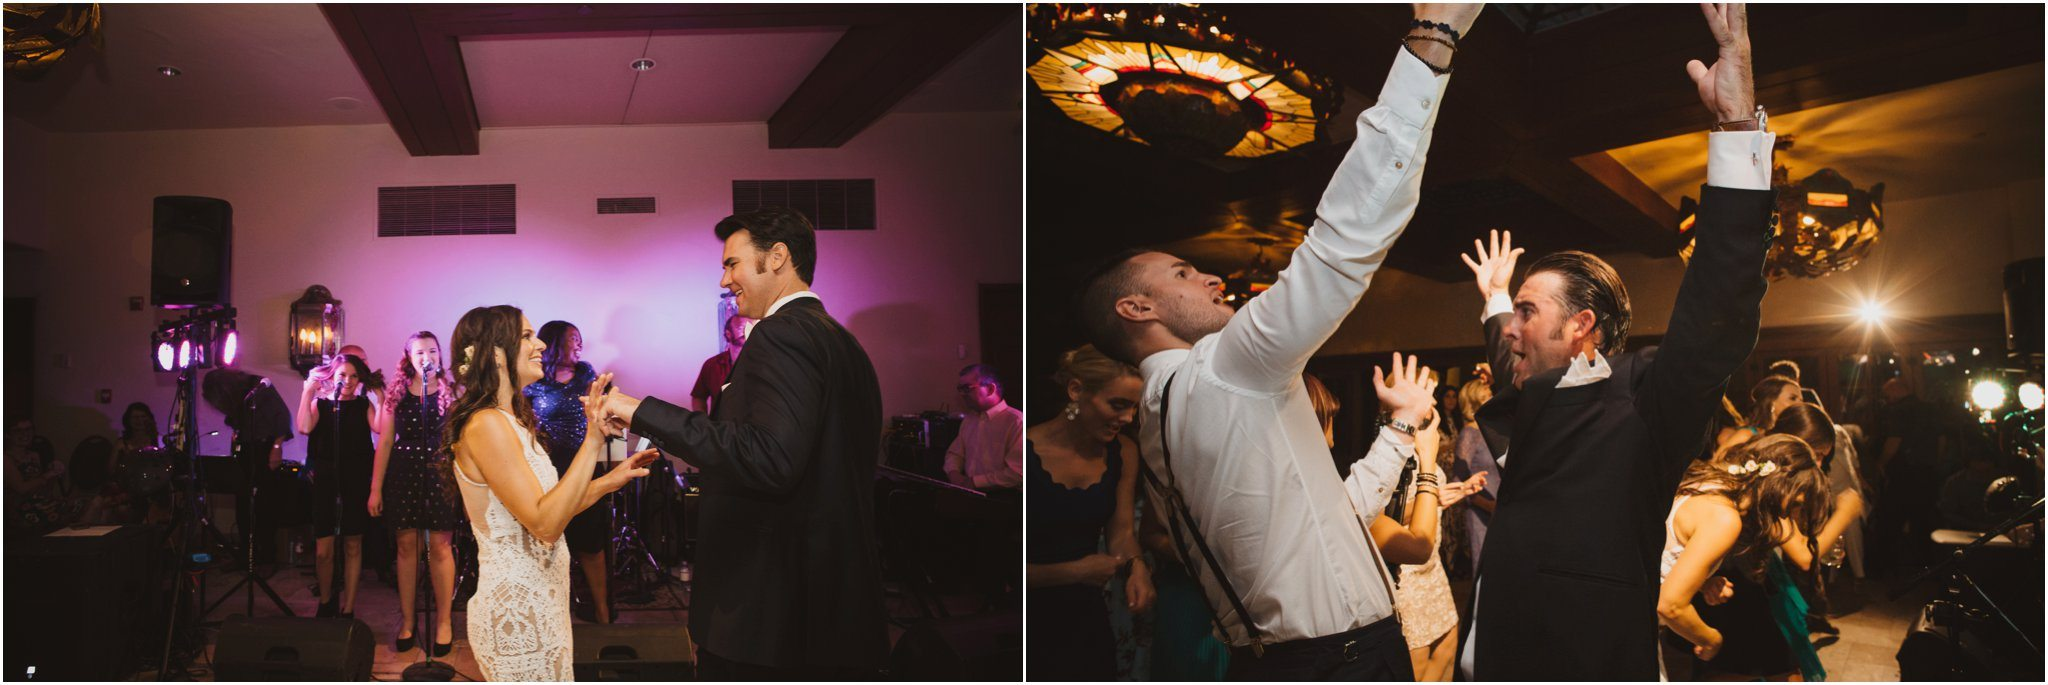 0070santa-fe-wedding-photographer_albuquerque-wedding-photographer_-southwest-wedding-photography_-blue-rose-studio